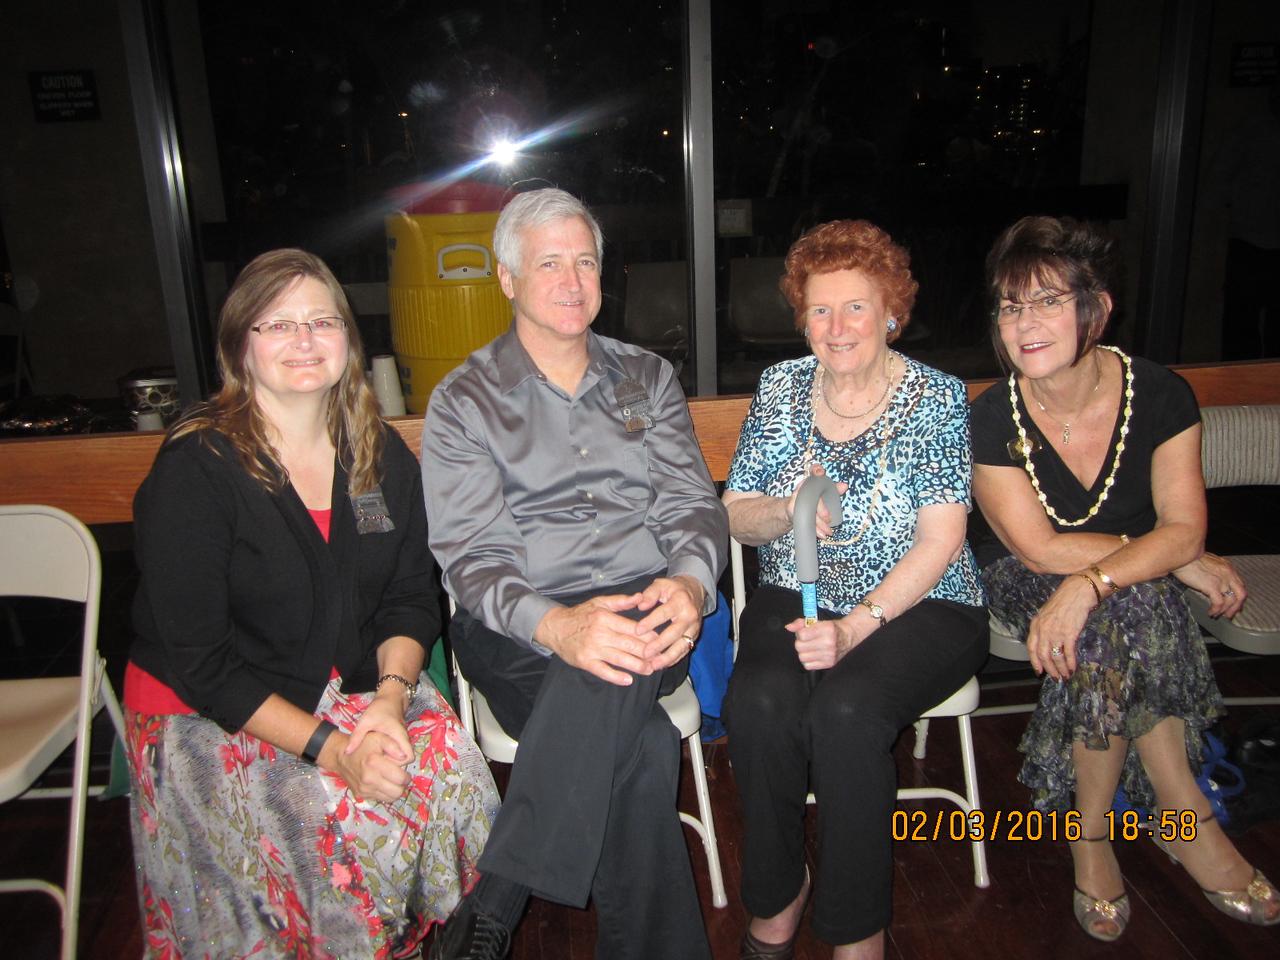 Allison & Dan ; Patricia & Judy from Australia